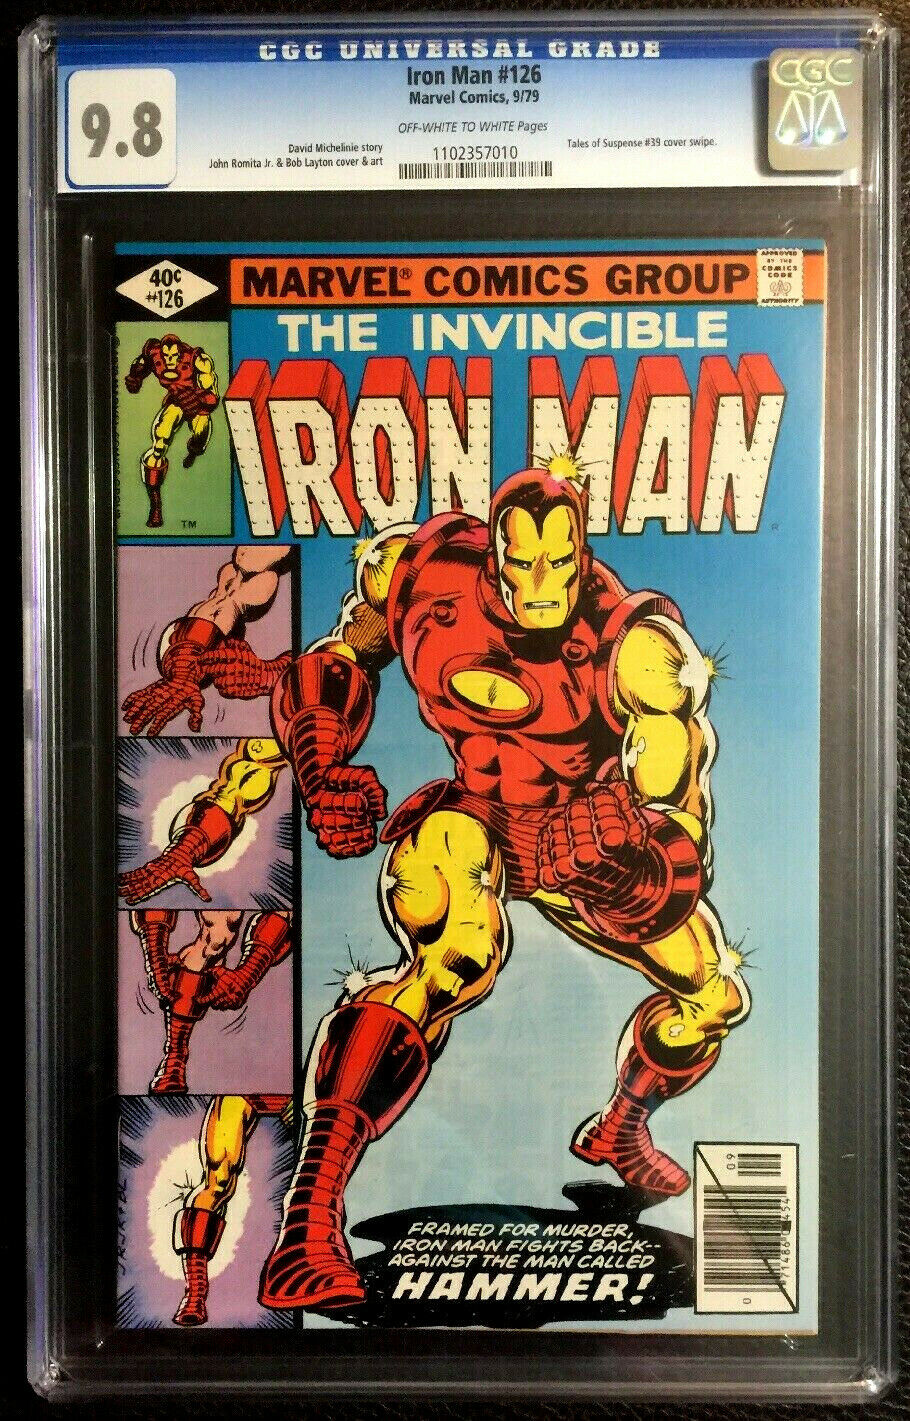 IRON MAN #126 CGC 9.8 MARVEL COMICS 1979 ROMITA JR LAYTON CLASSIC COVER SWIPE